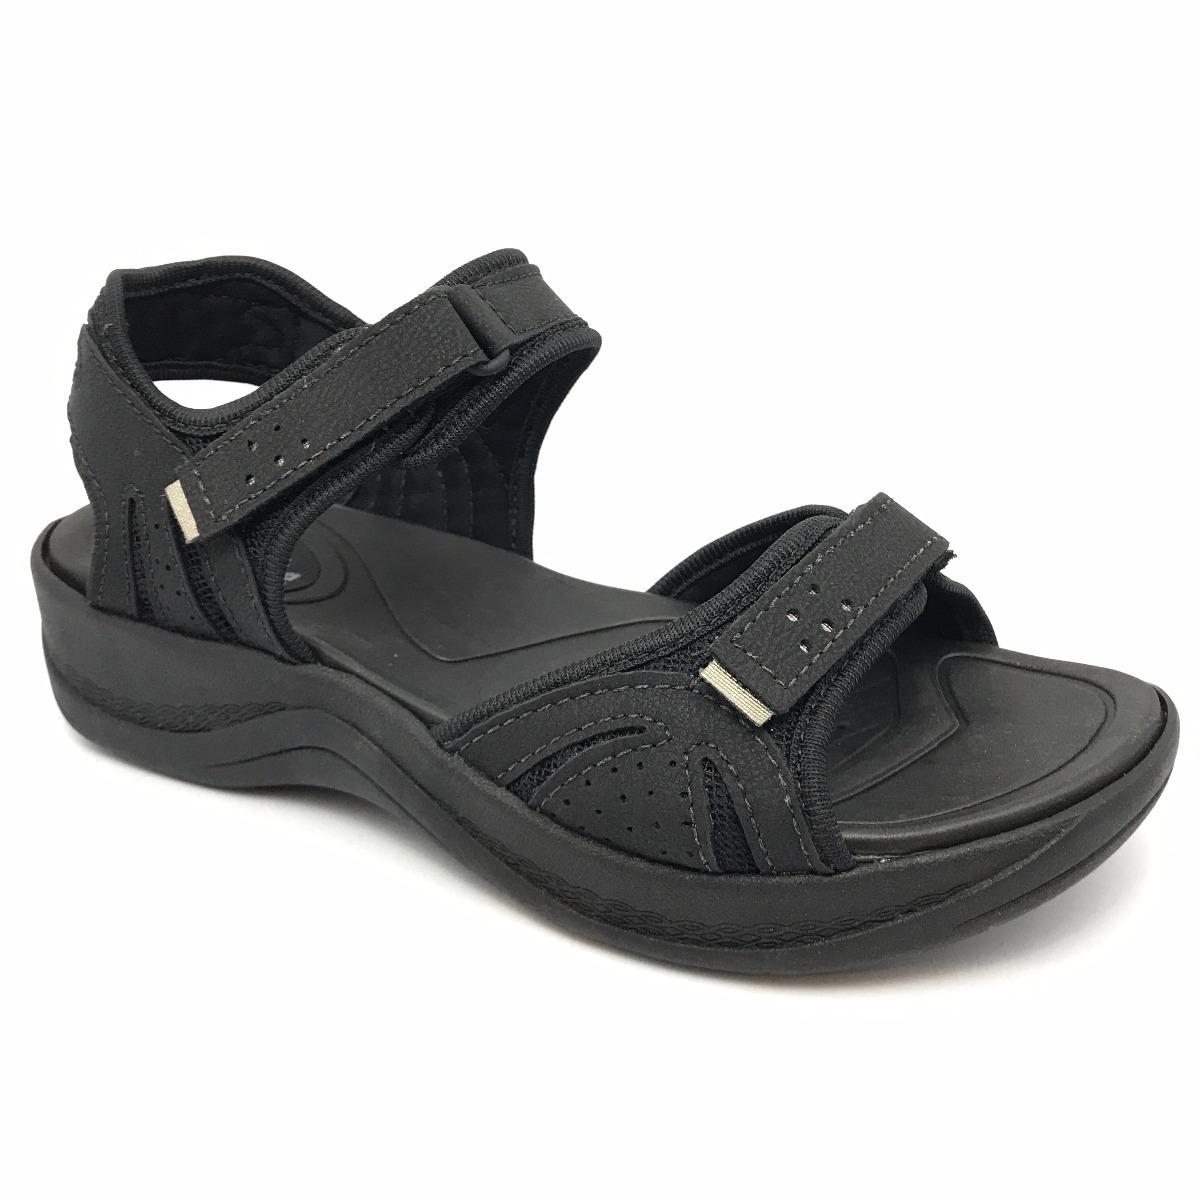 e6b06bee15 sandália papete feminina new face preta 20302f15. Carregando zoom.